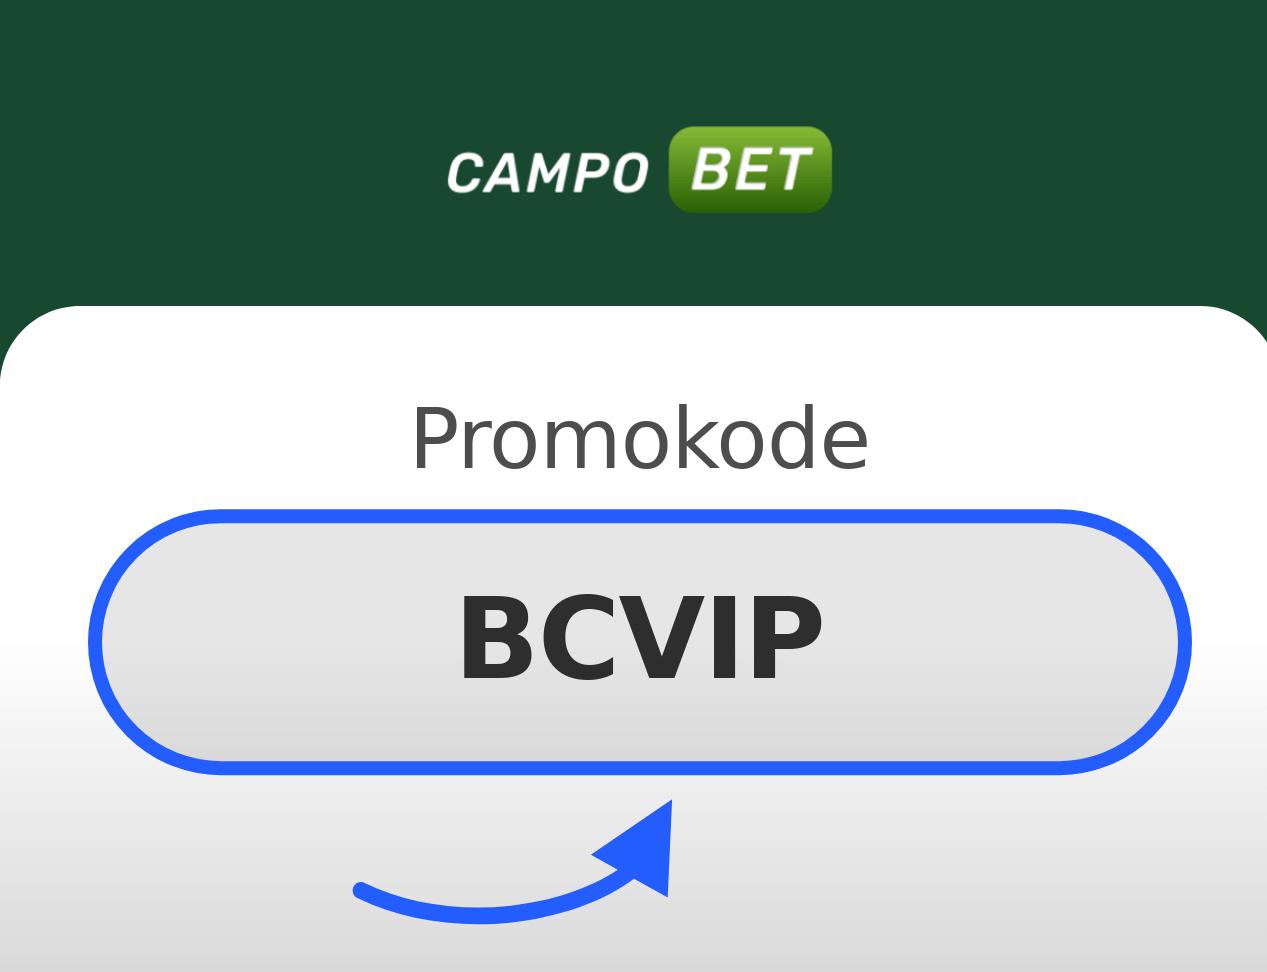 Campobet Promocode